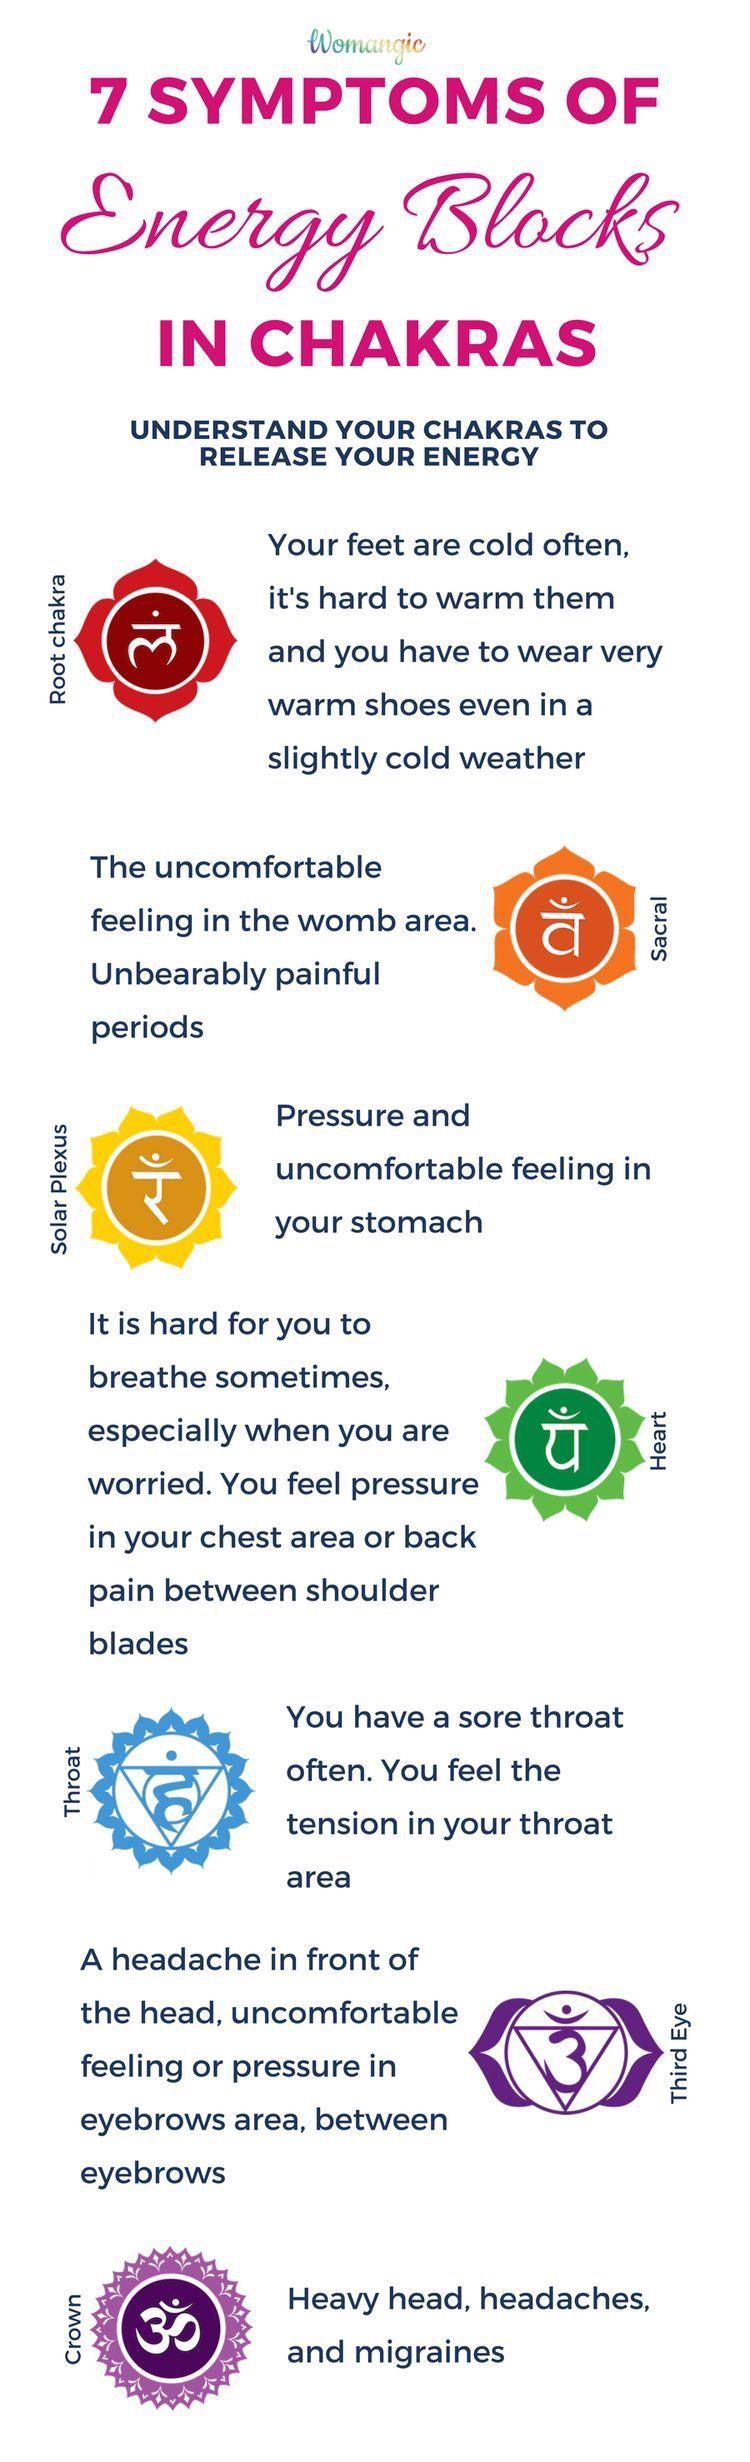 symptoms of energy blocks in chakras | The Spiritual Life